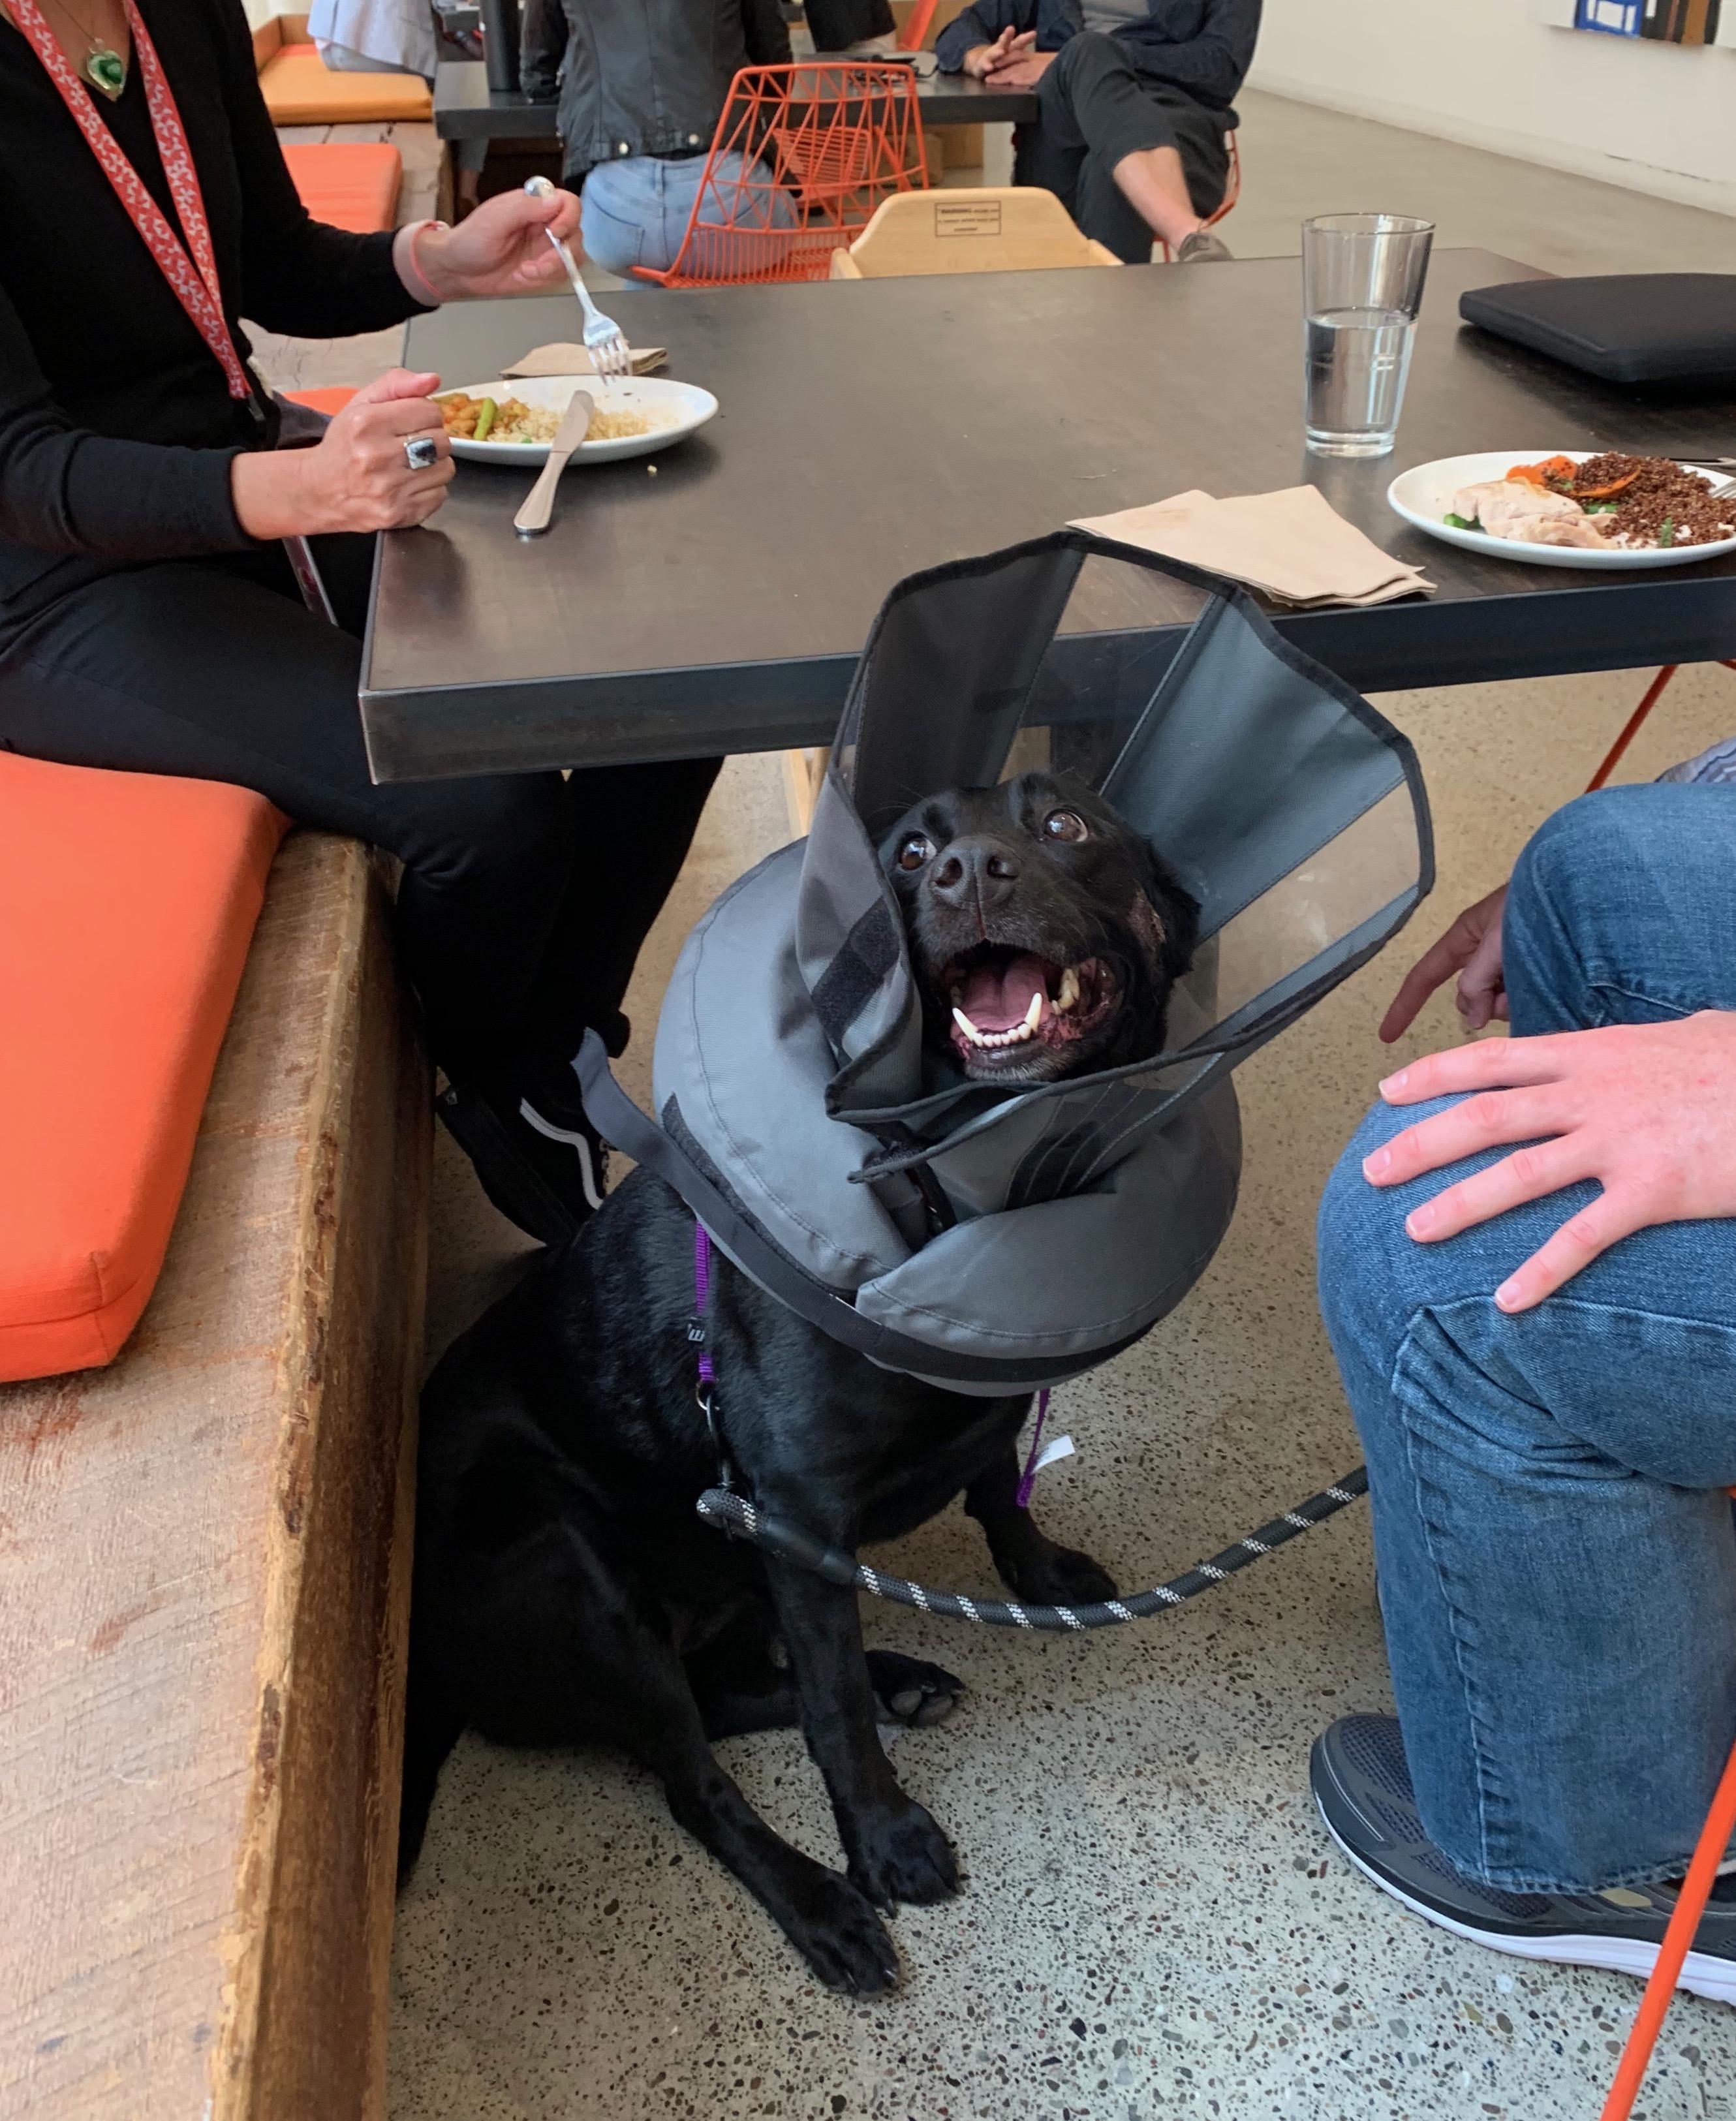 Black Labrador Retriever Looking Sad And Wearing A Ridiculous Cone